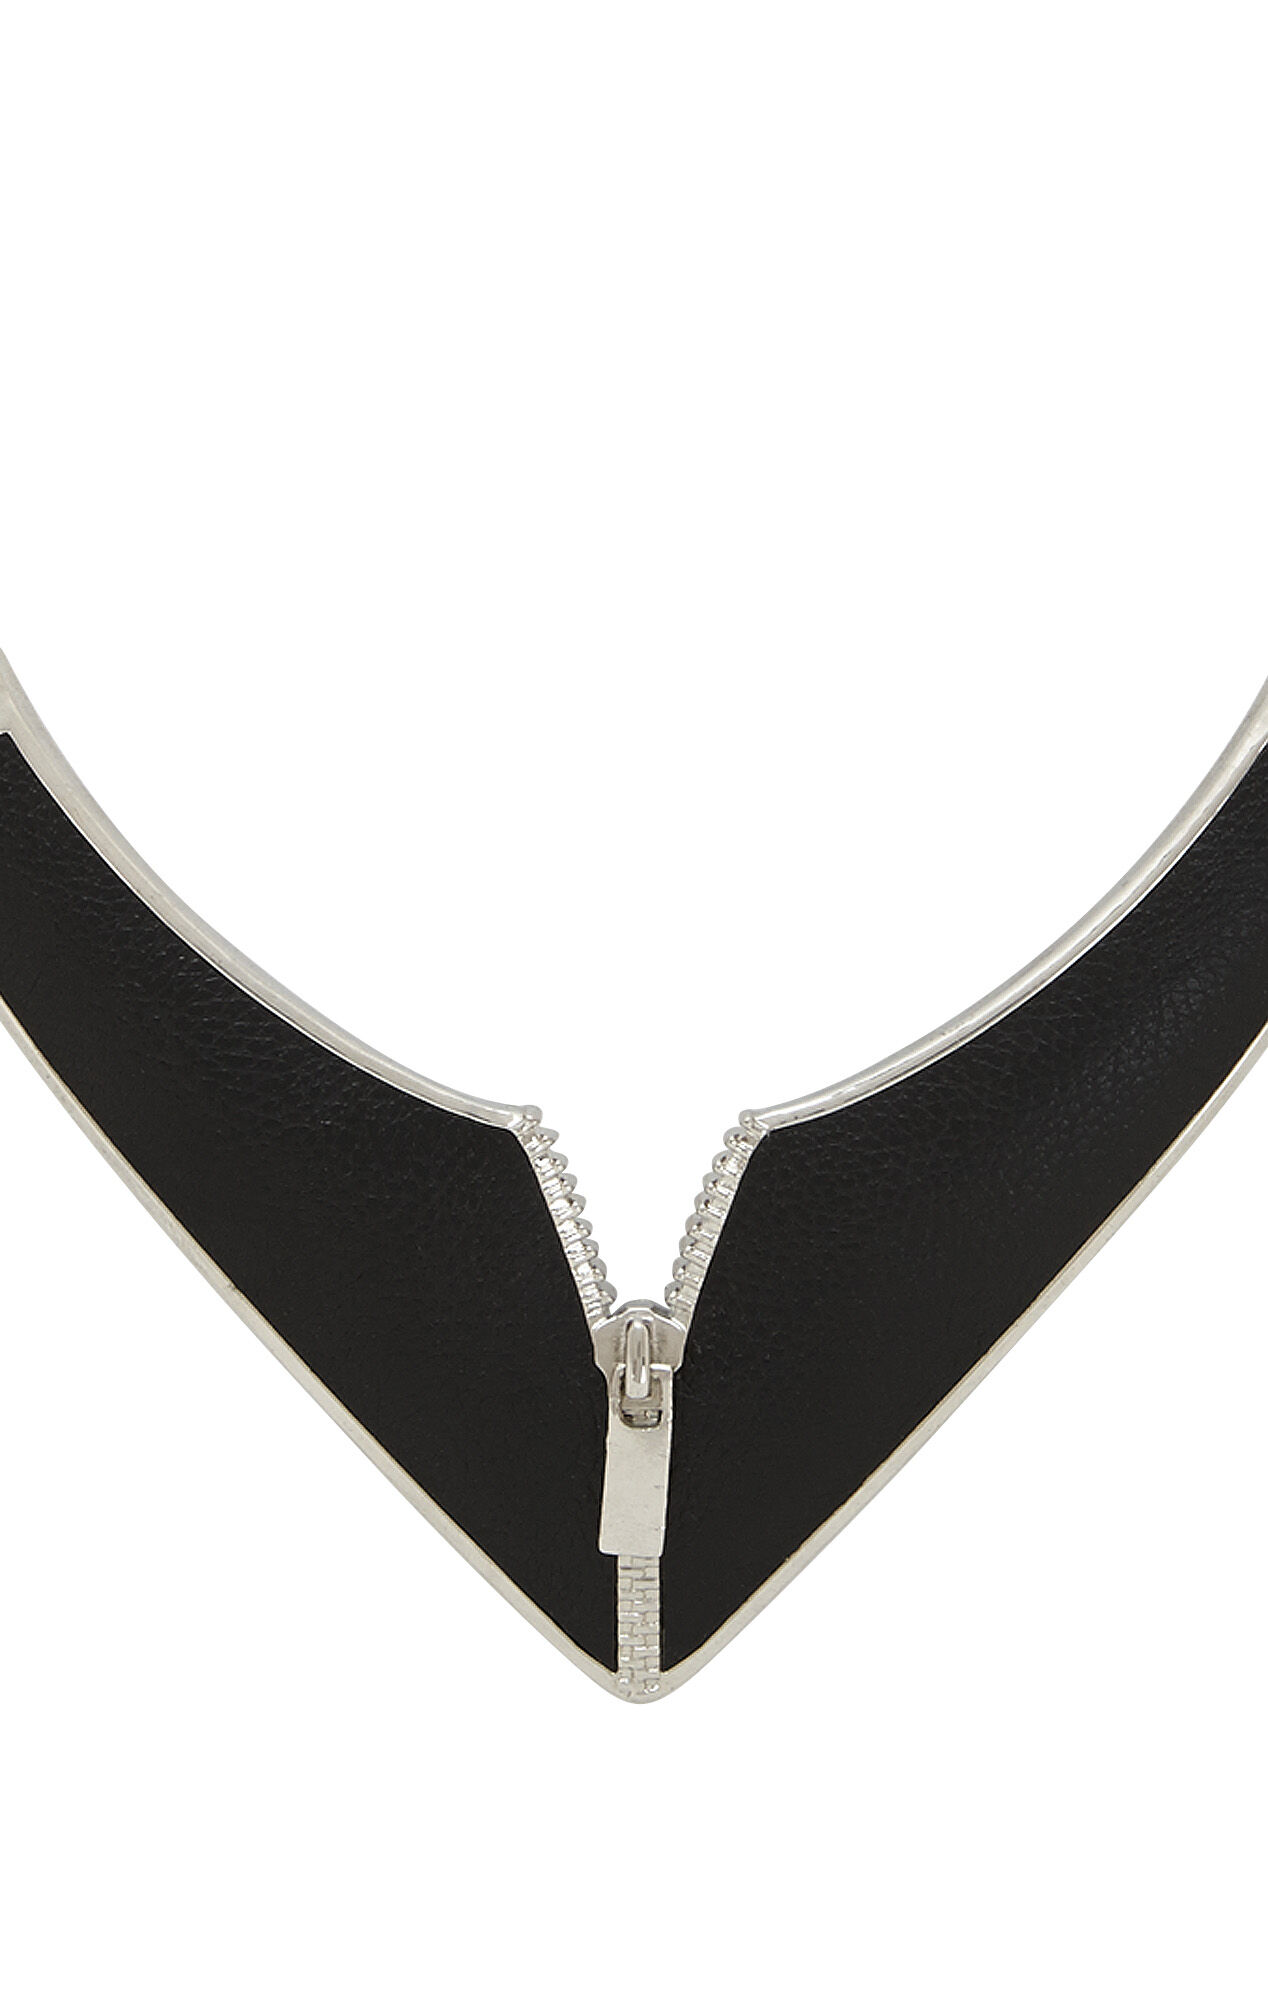 Inlay Zipper Necklace